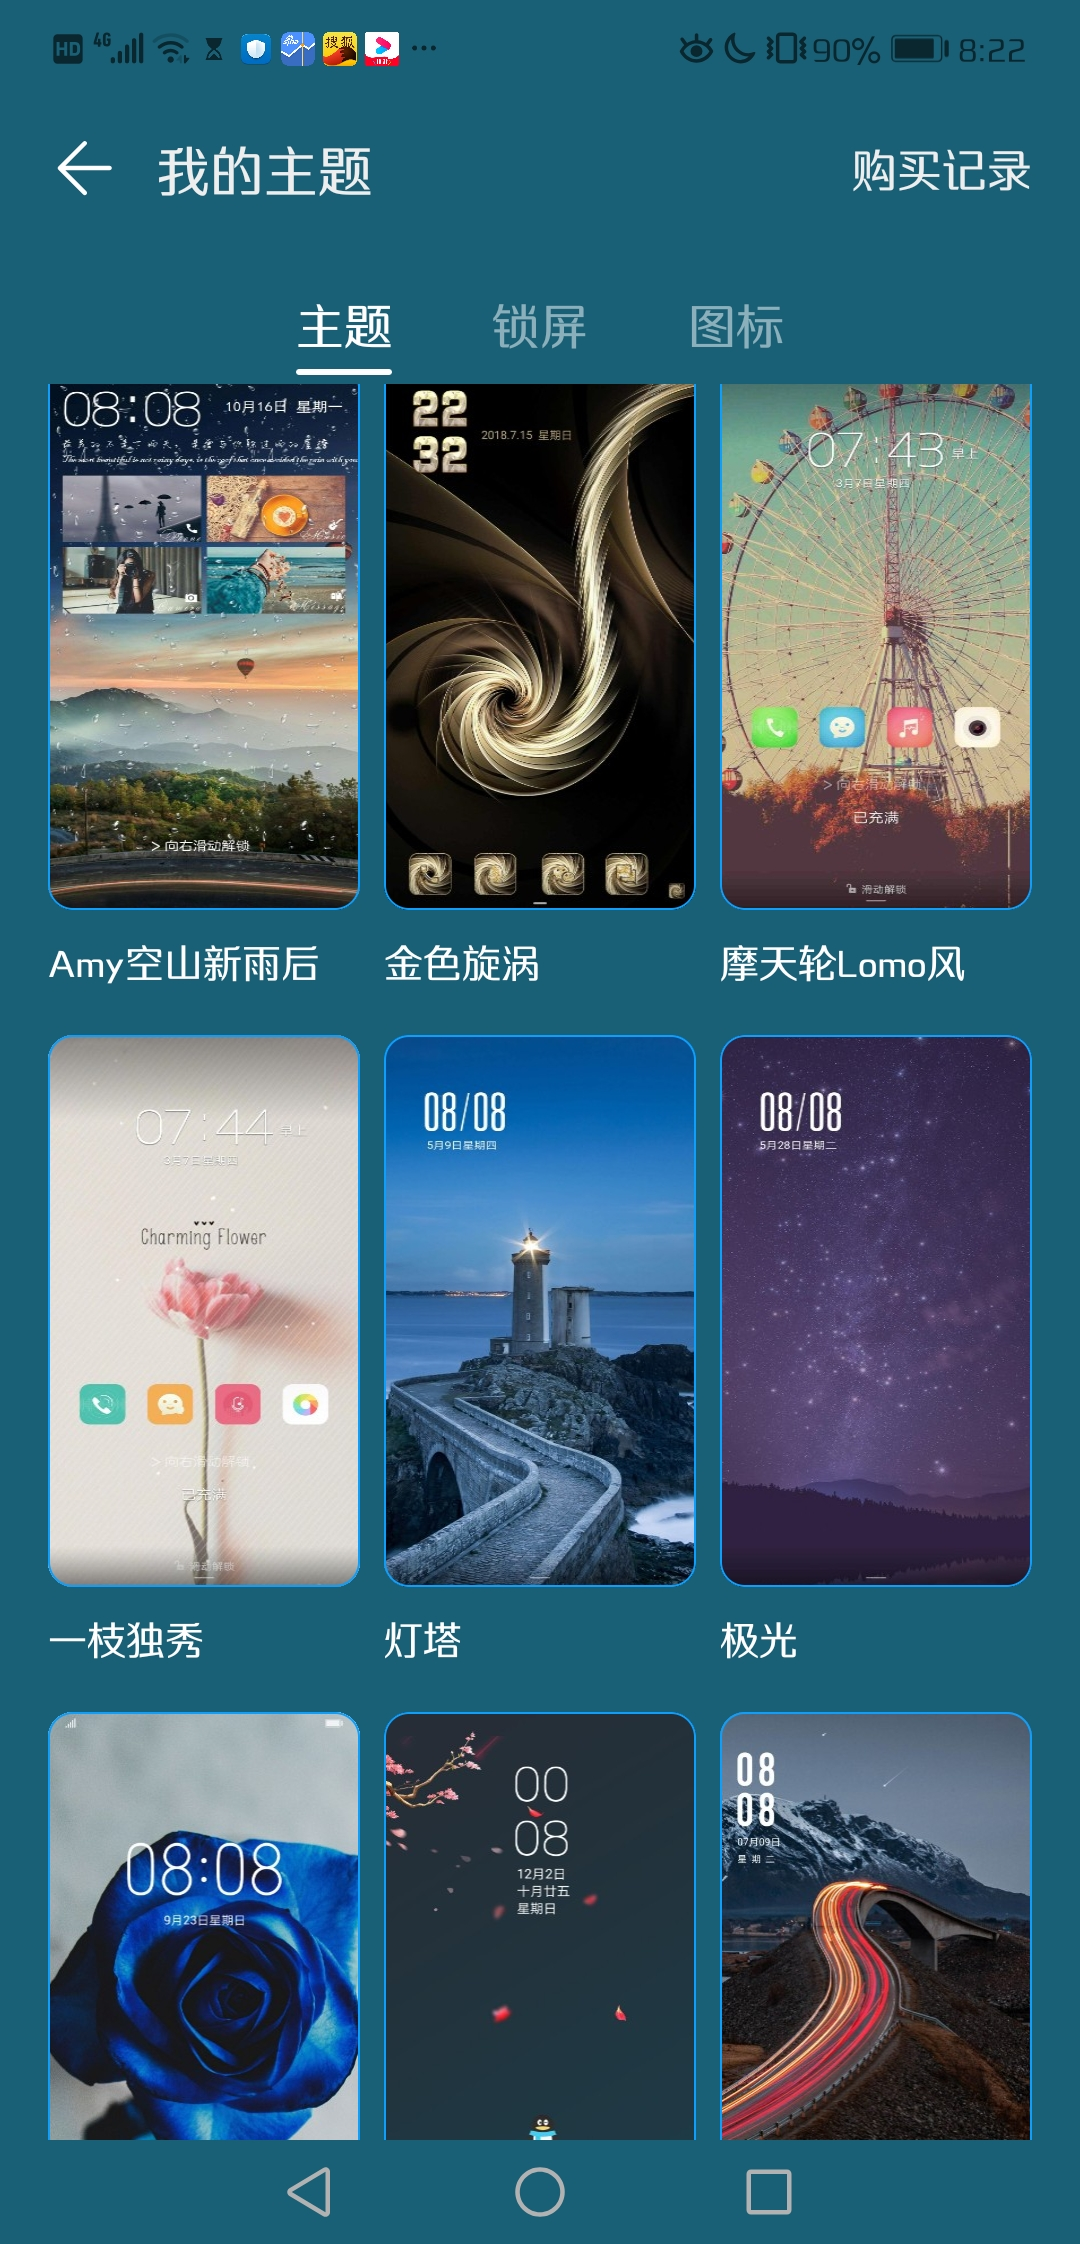 Screenshot_20191115_082242_com.huawei.android.thememanager.jpg